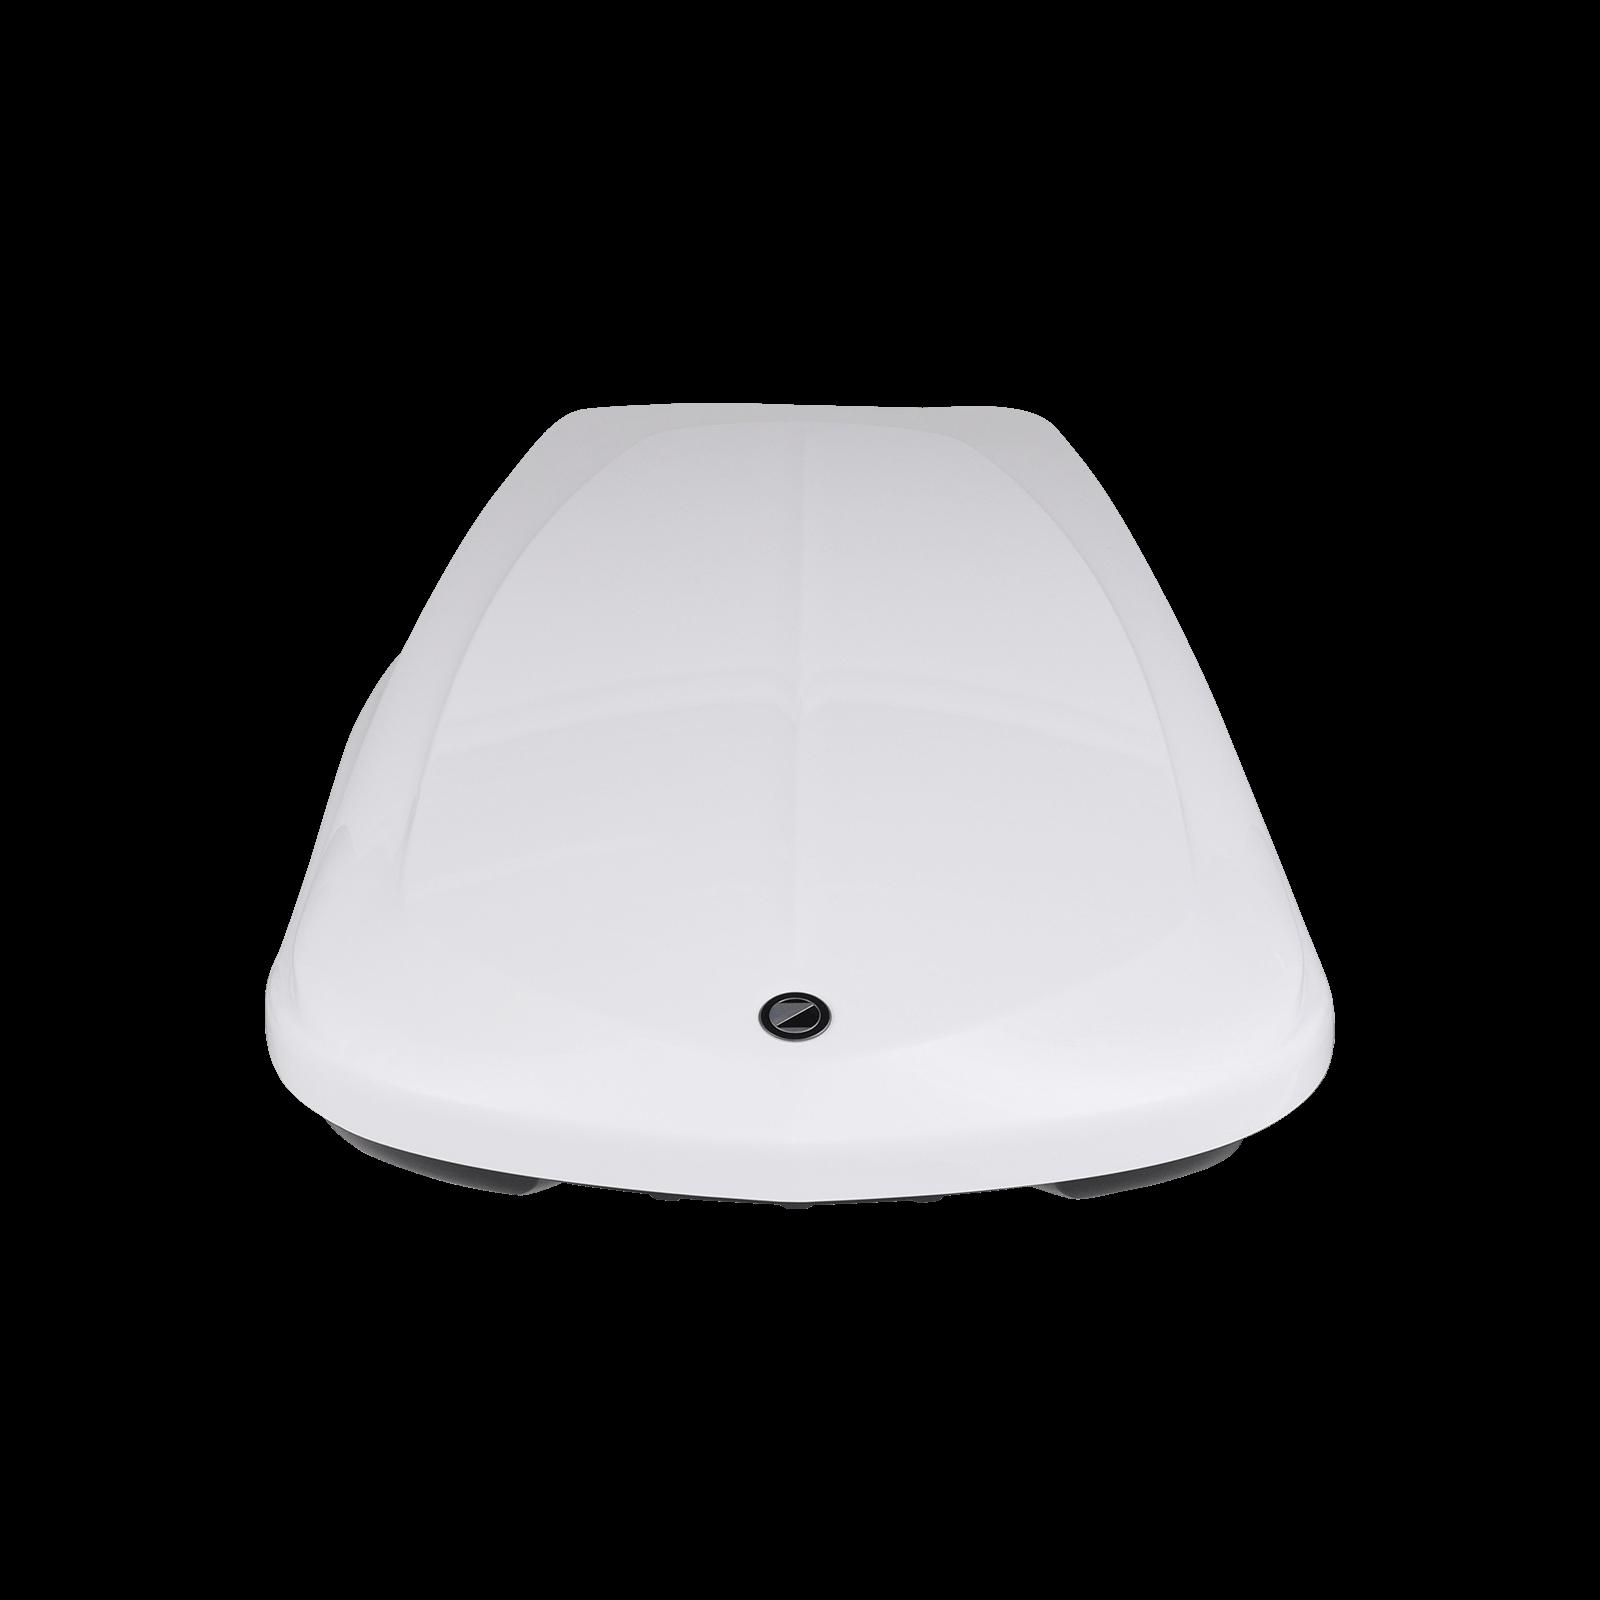 Dachbox Hapro Zenith 8.6 PureWhite - Bild 3